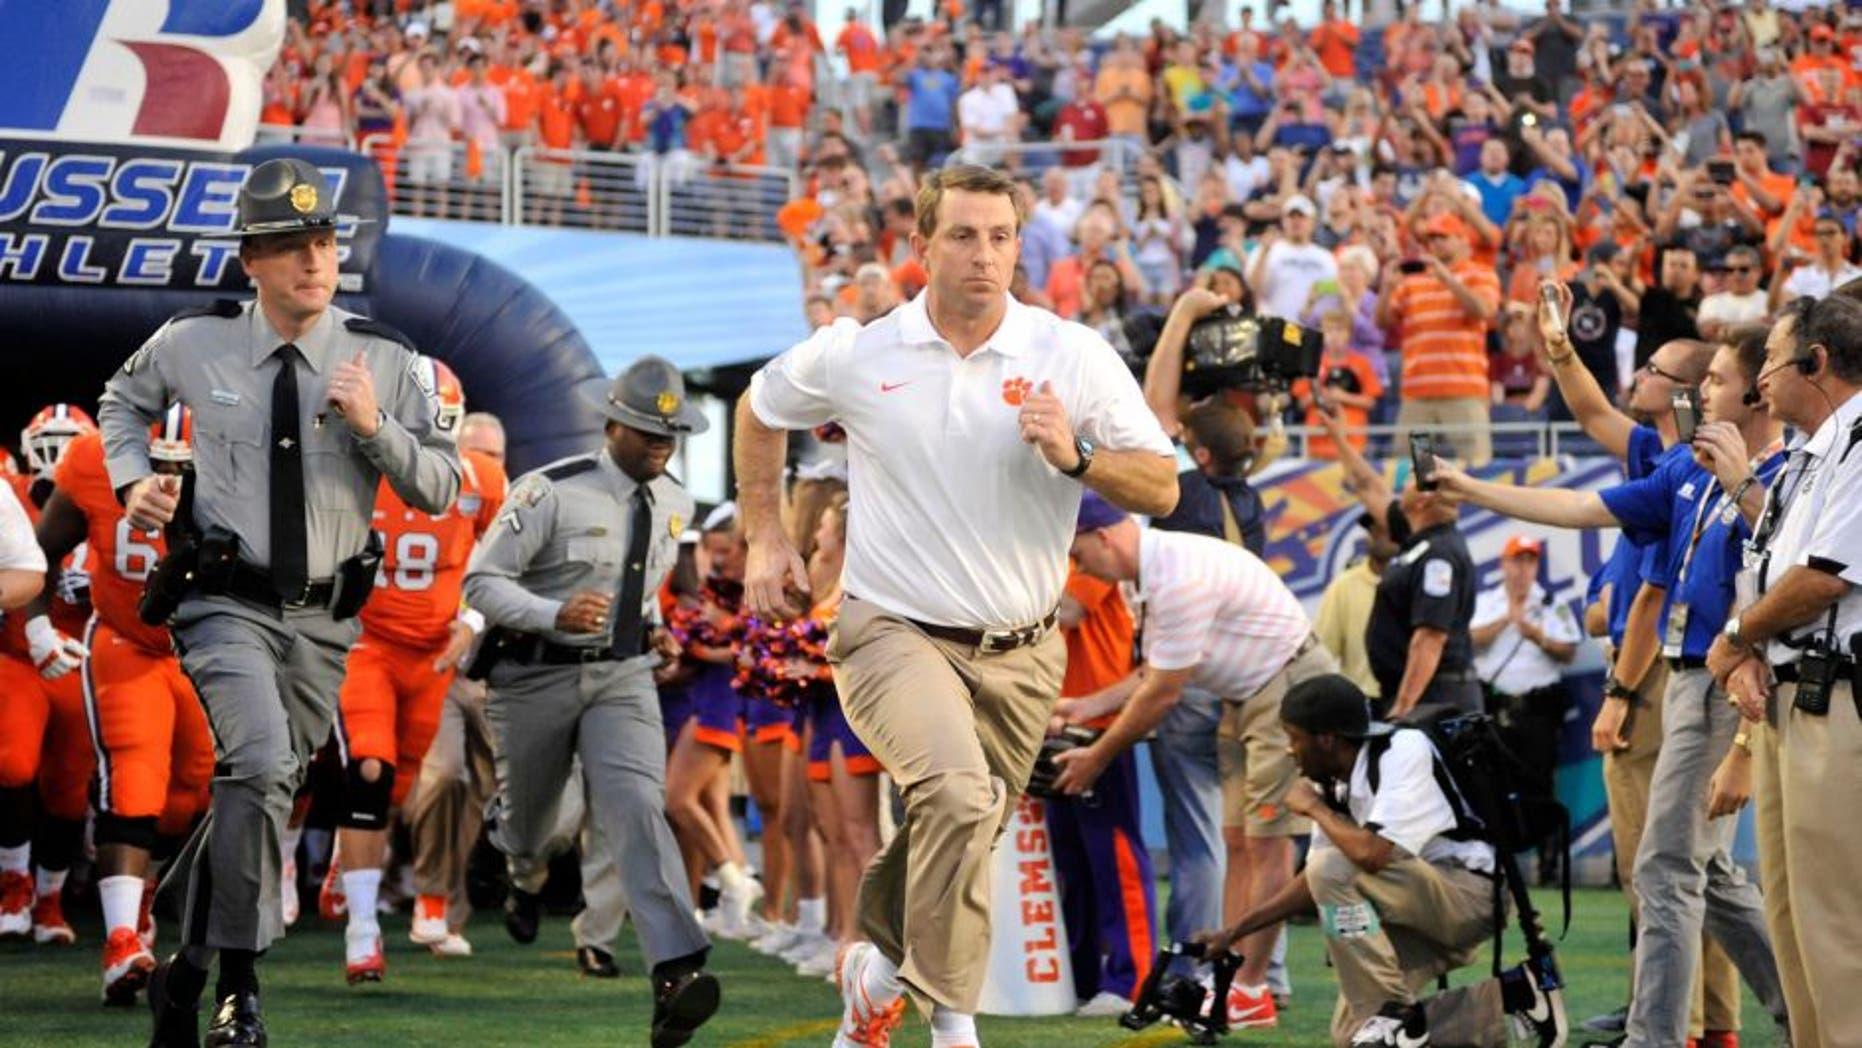 Dec 29, 2014; Orlando, FL, USA; Clemson Tigers head coach Dabo Swinney runs onto the field before the 2014 Russell Athletic Bowl at Florida Citrus Bowl. Mandatory Credit: David Manning-USA TODAY Sports